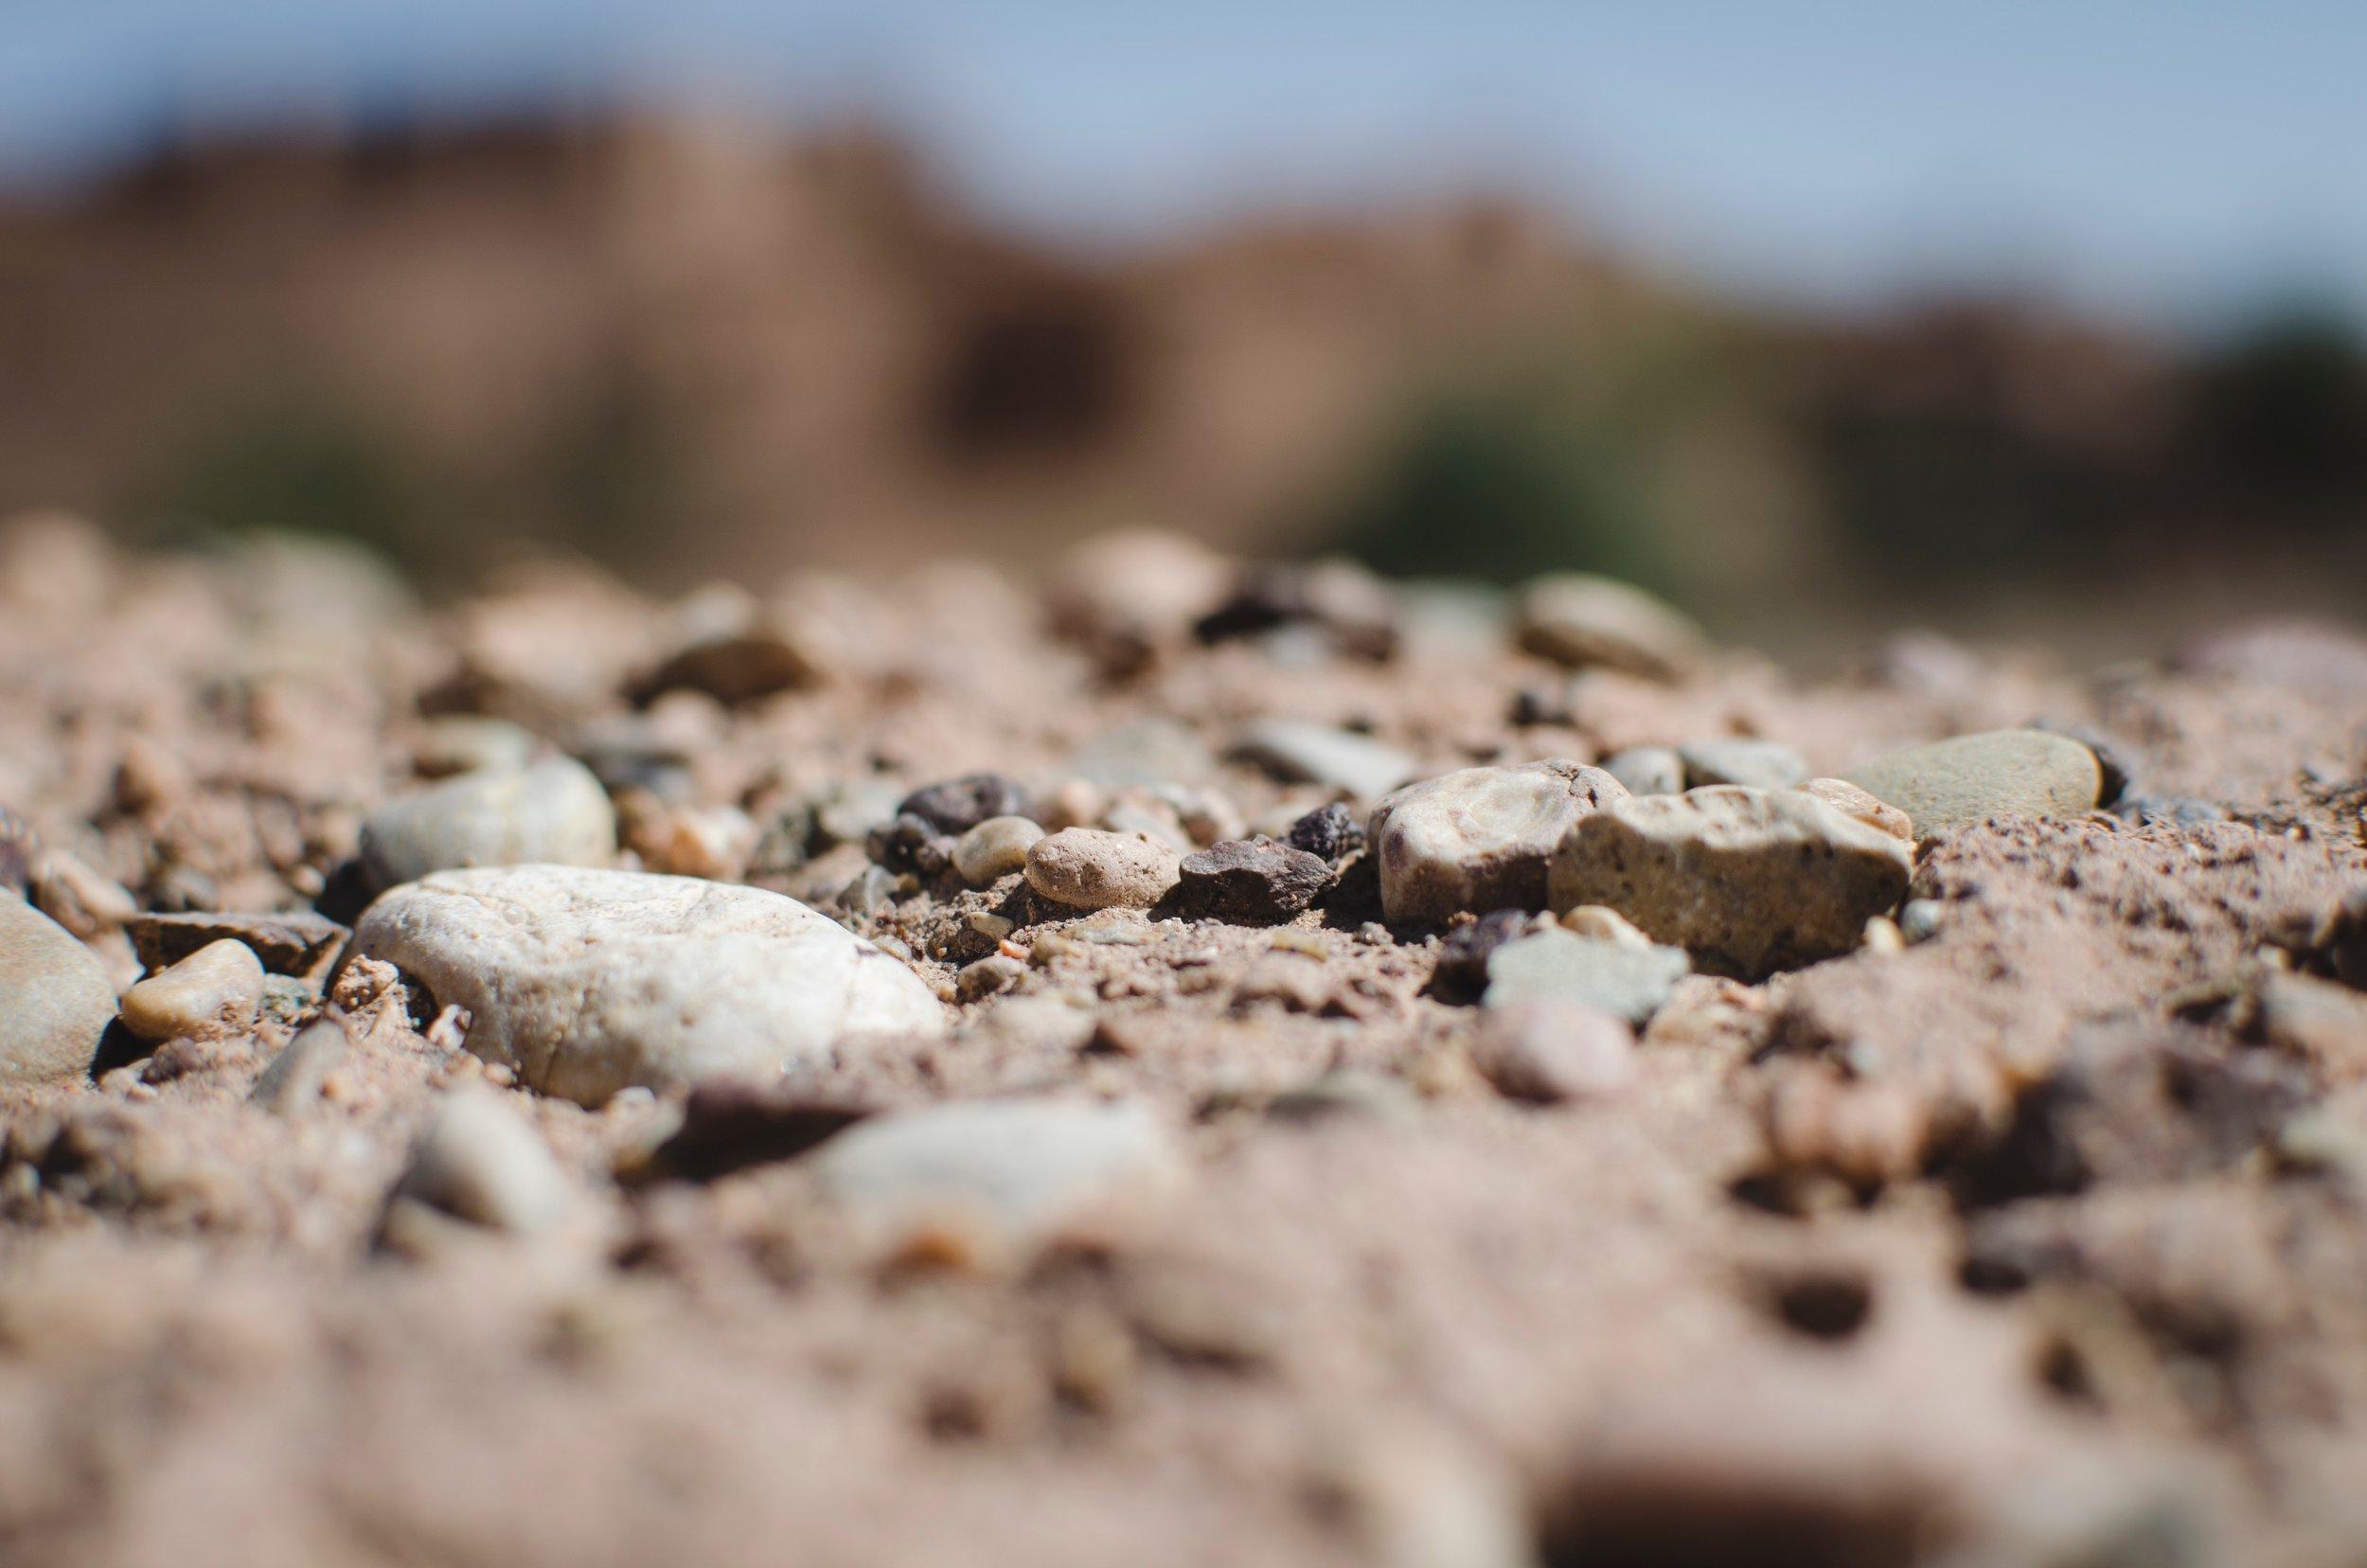 Asbestos in Soils -